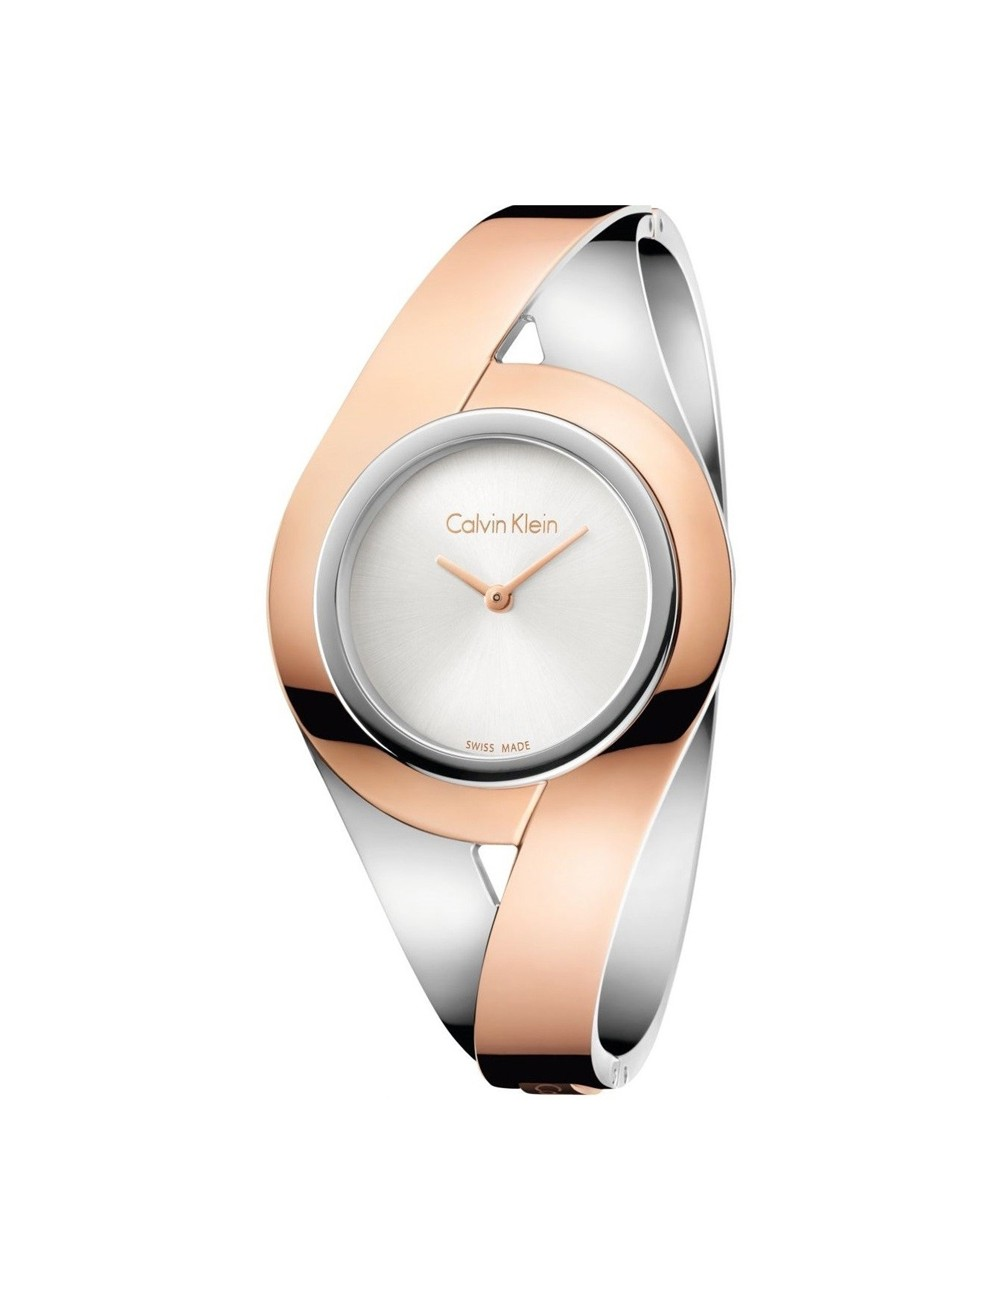 Calvin Klein Sensual K8E2S1Z6 Ladies Watch